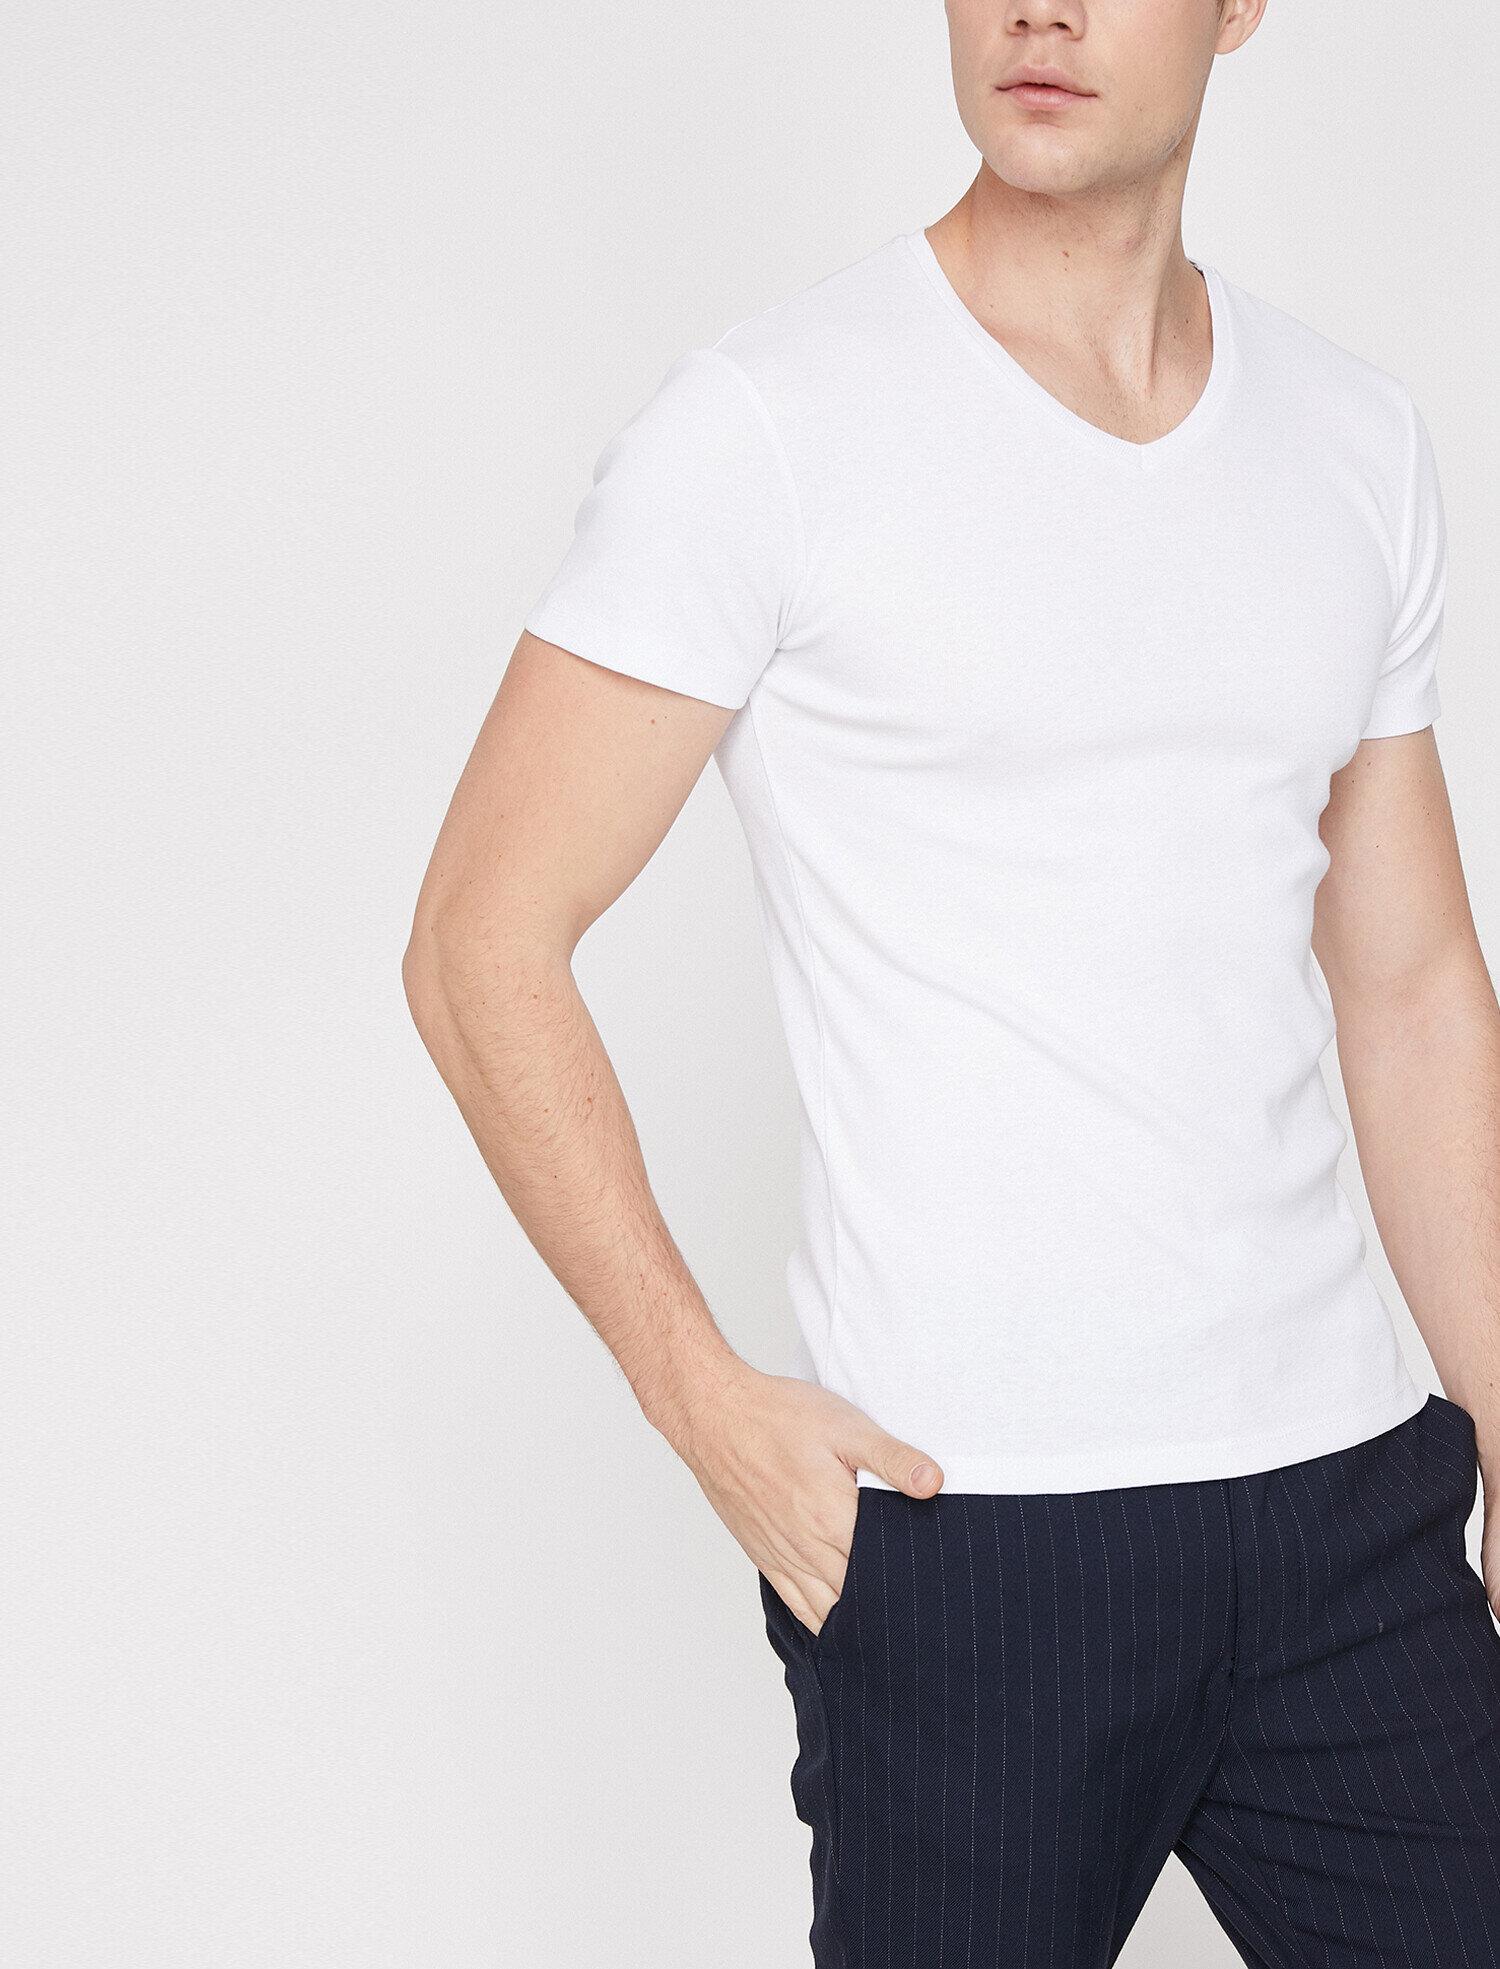 Koton Erkek V Yaka T-Shirt Beyaz Ürün Resmi